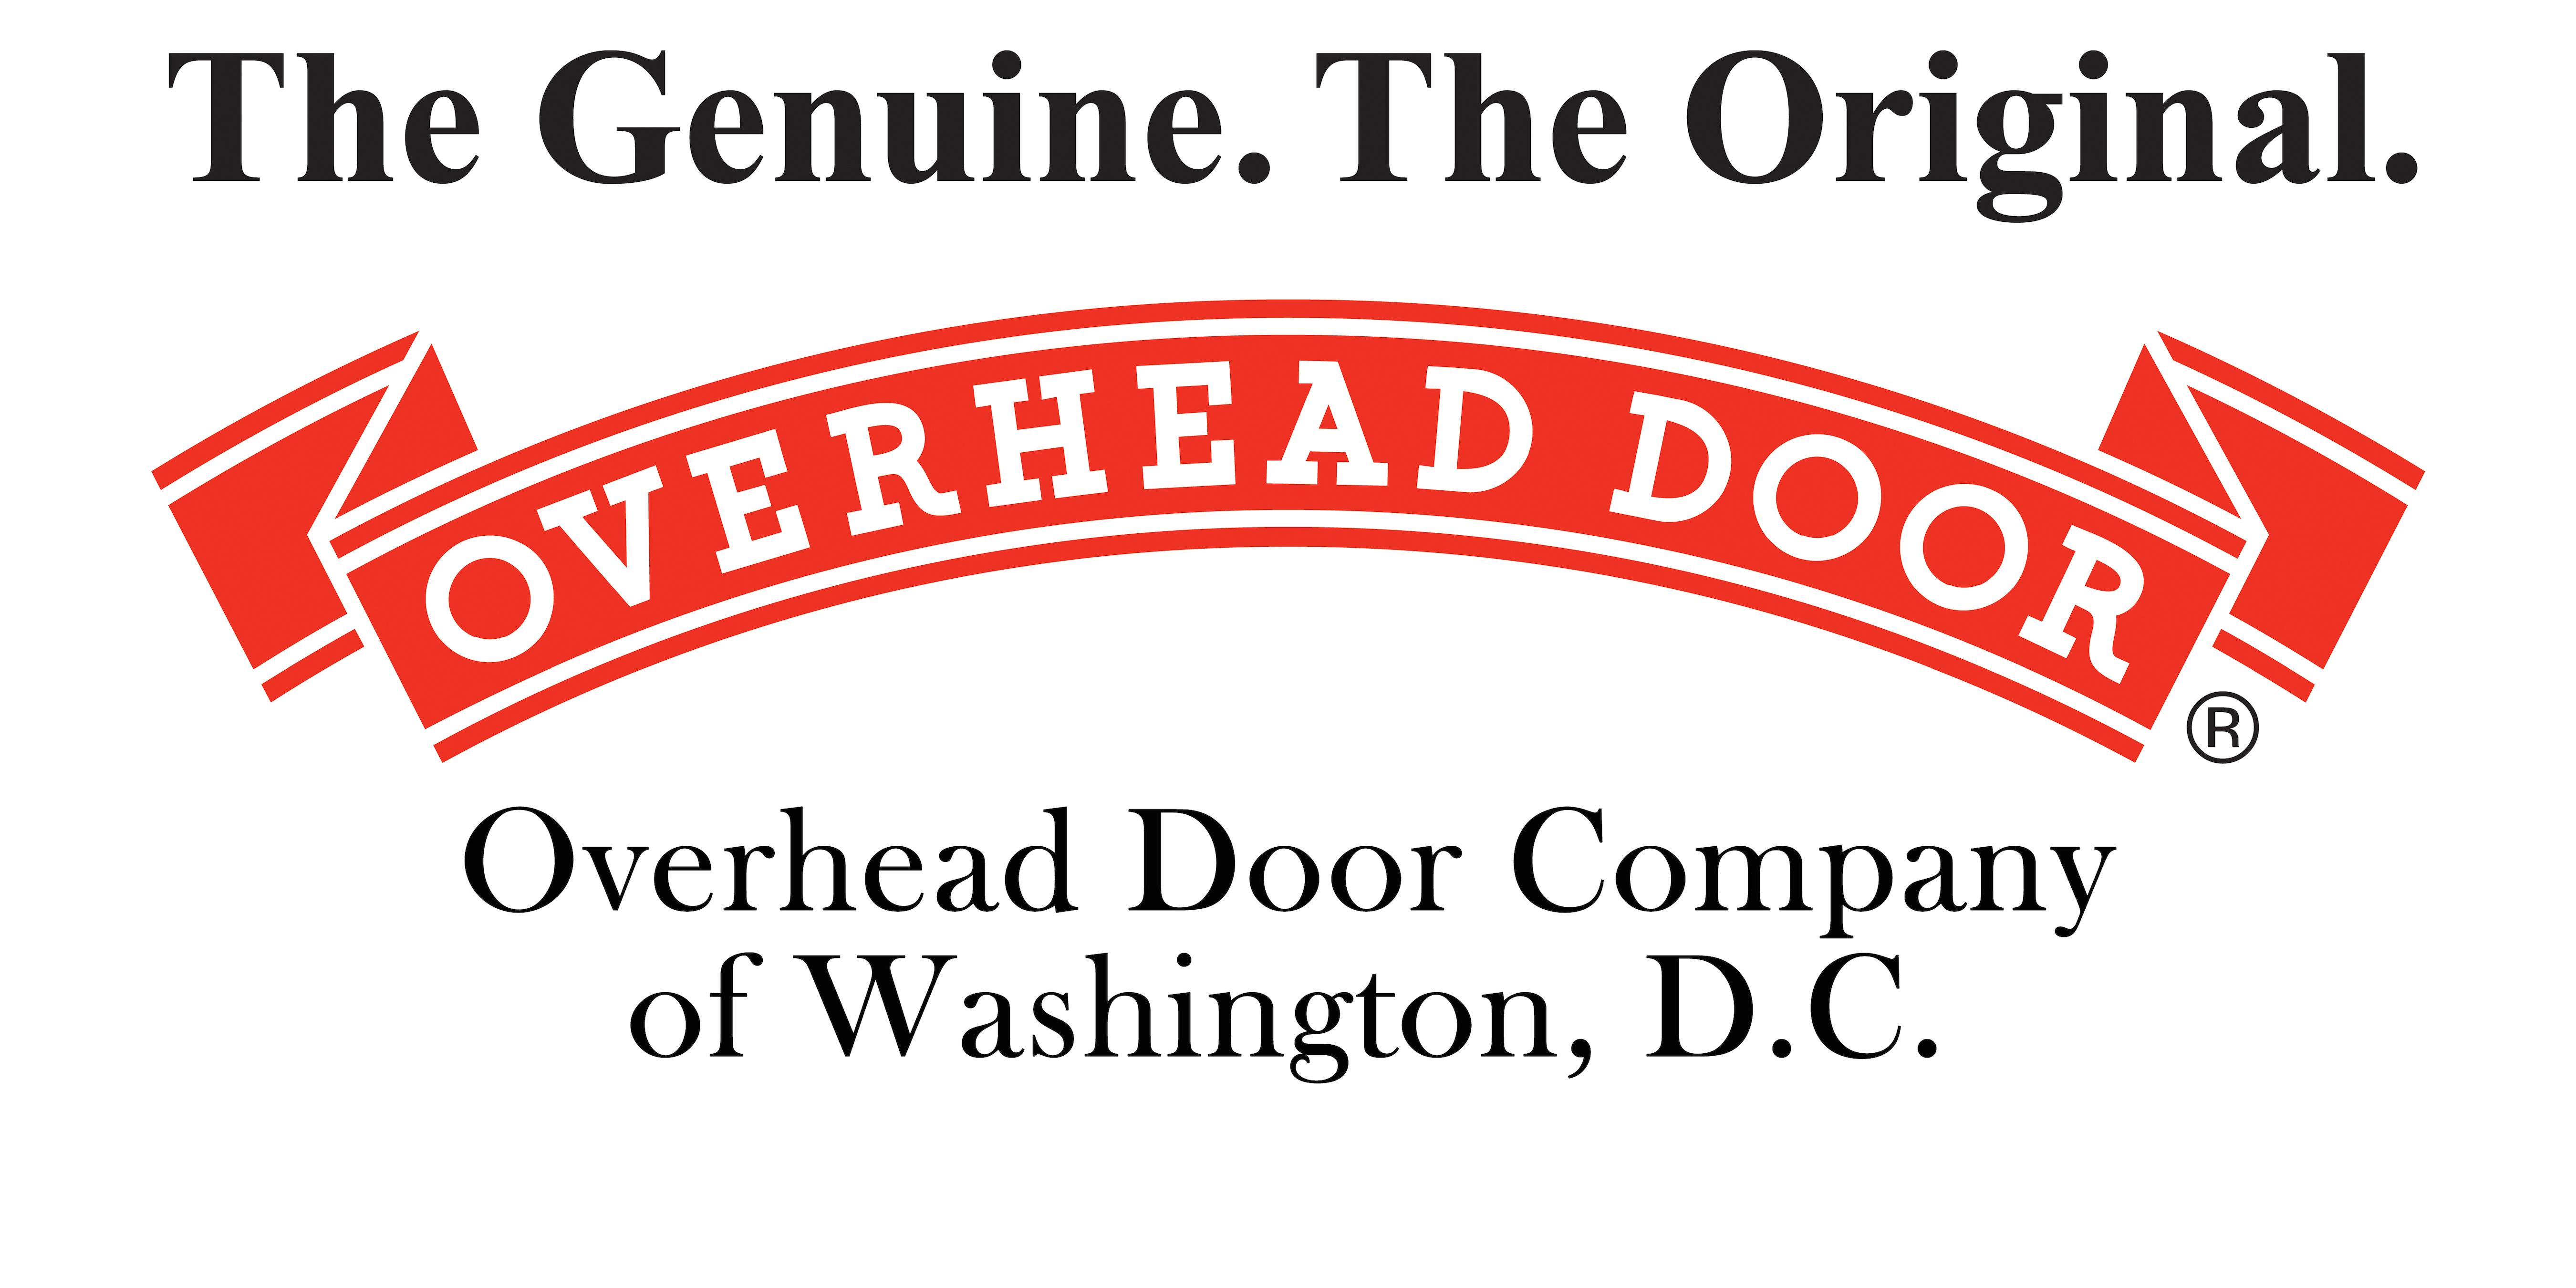 Overhead Door Company Of Washington DC 6841 Distribution Dr, Beltsville, MD  20705   YP.com